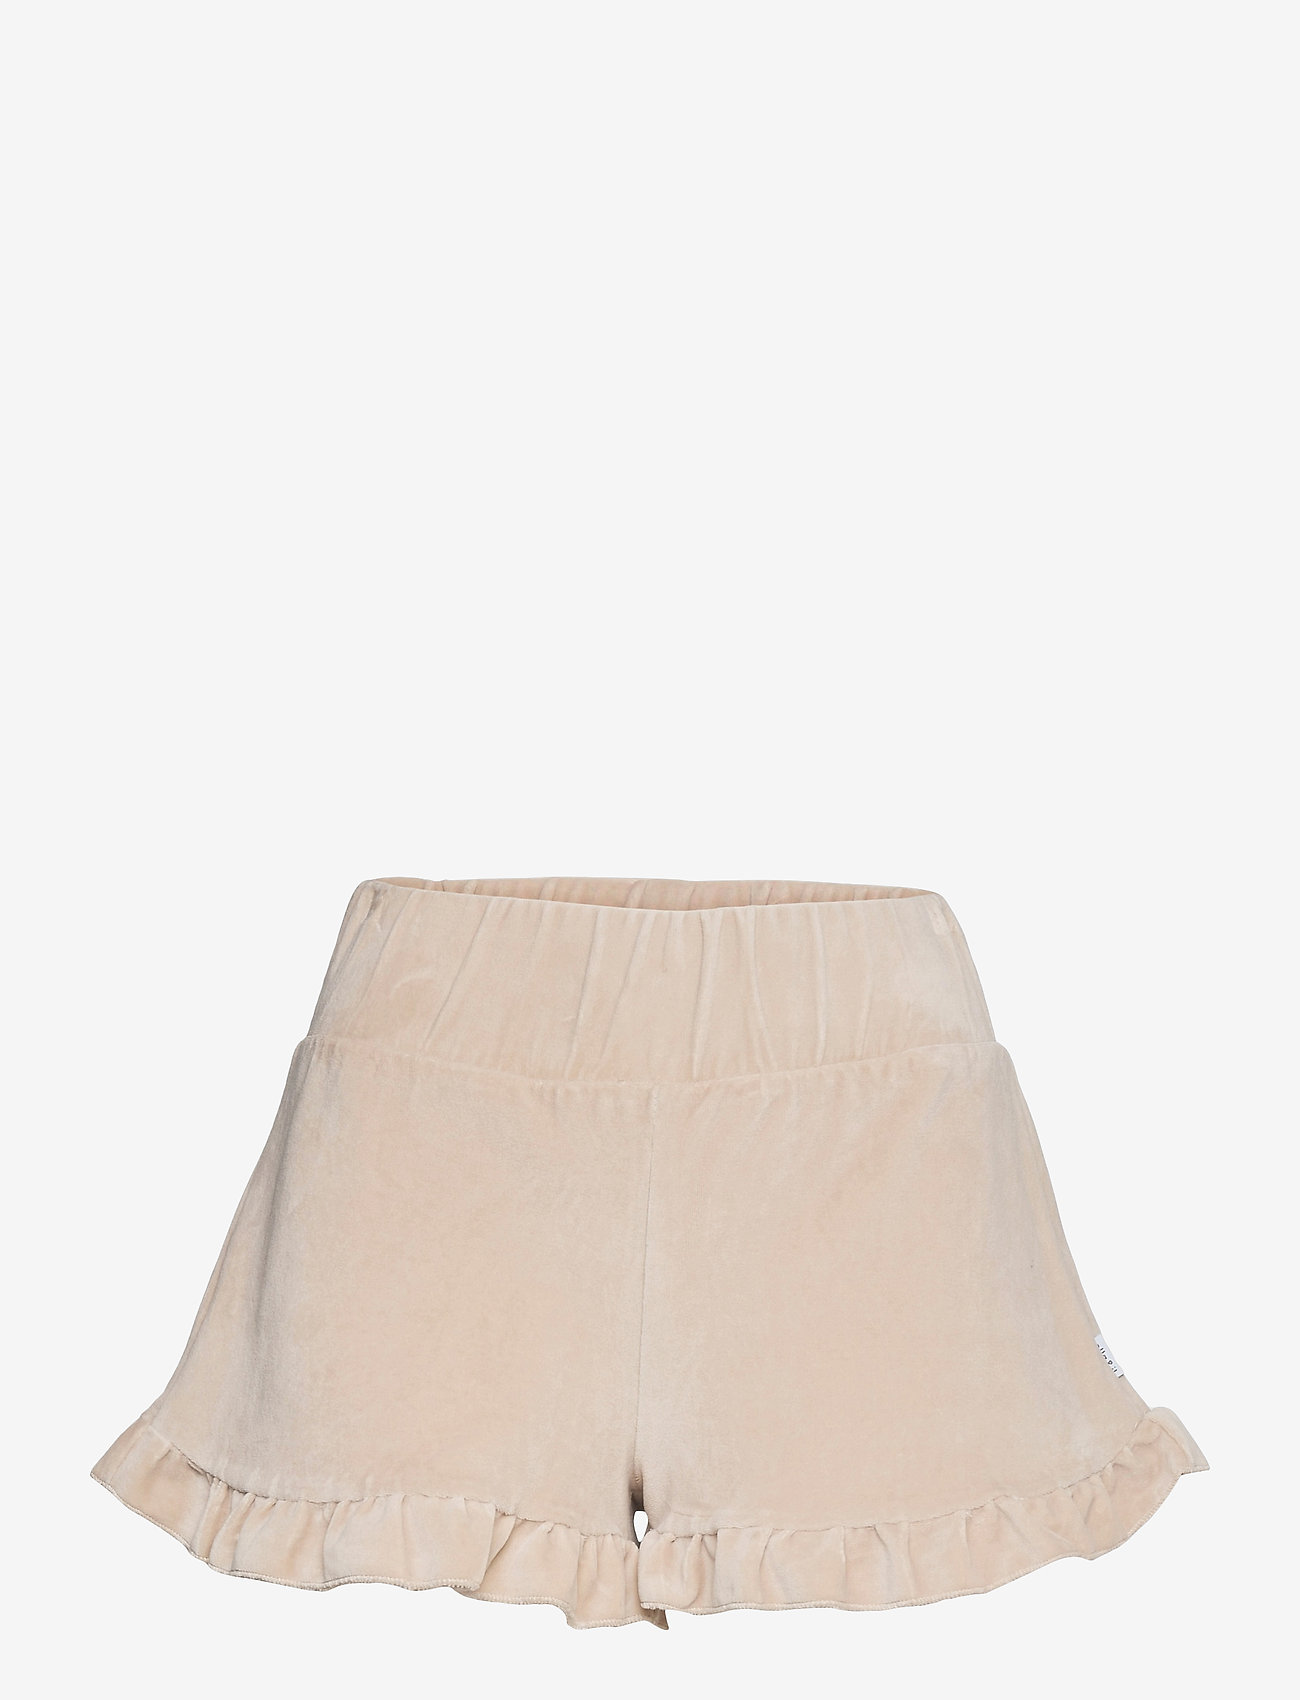 ella&il - Hay velour shorts - shorts casual - beige - 0